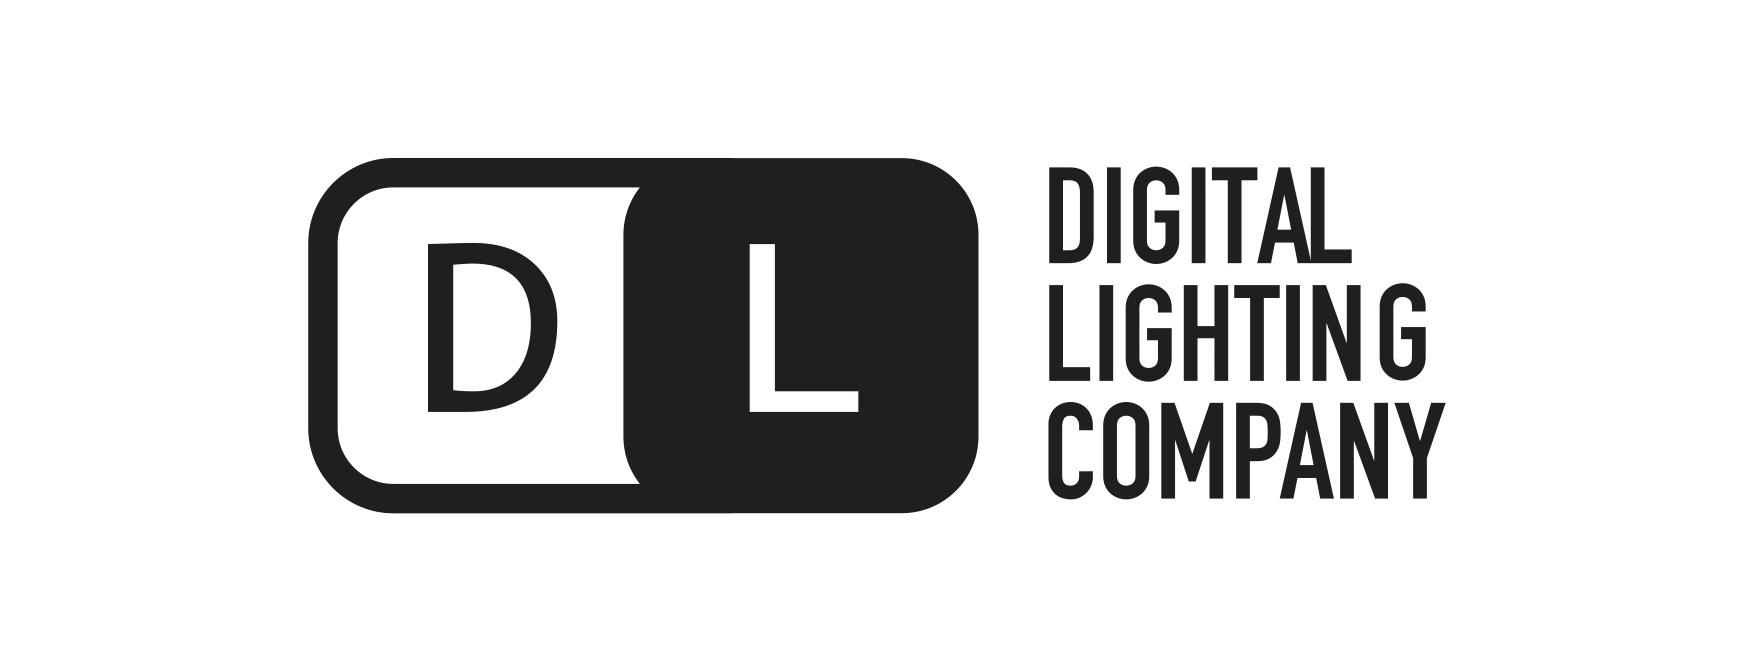 Digital Lighting Company_LOGO (1)